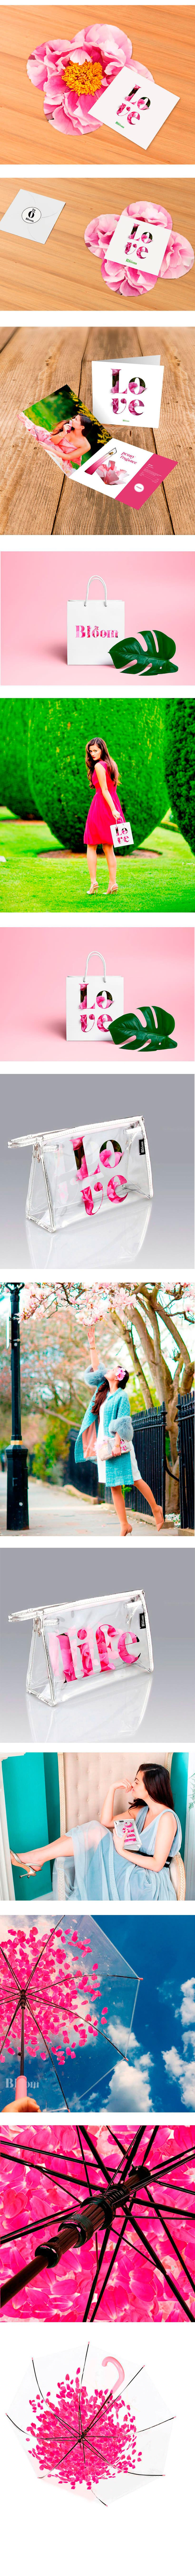 Bloom, perfume 2